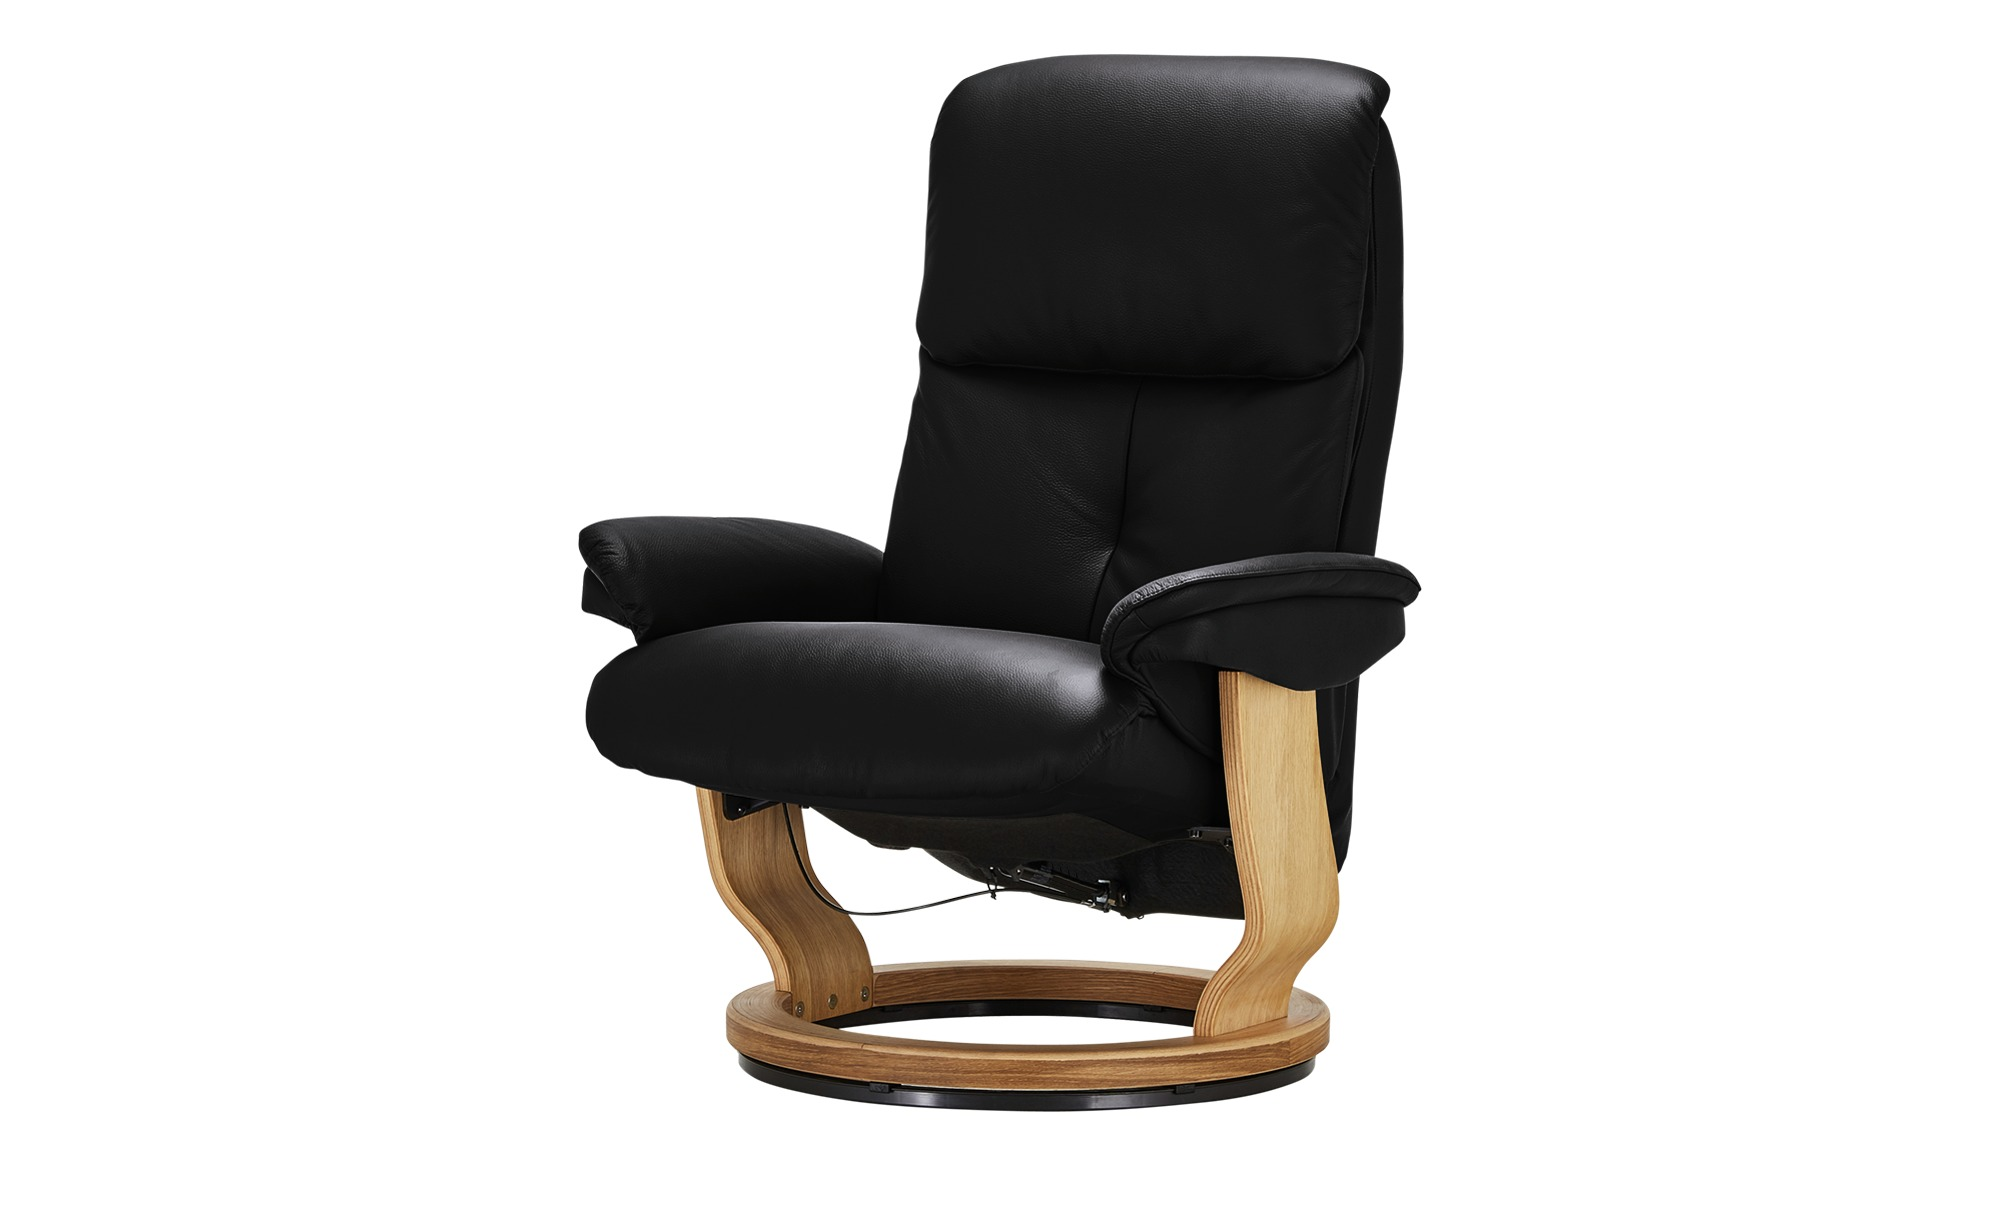 Relaxsessel  Farso ¦ schwarz ¦ Maße (cm): B: 85 H: 114 T: 92 Polstermöbel > Sessel > Ledersessel - Höffner